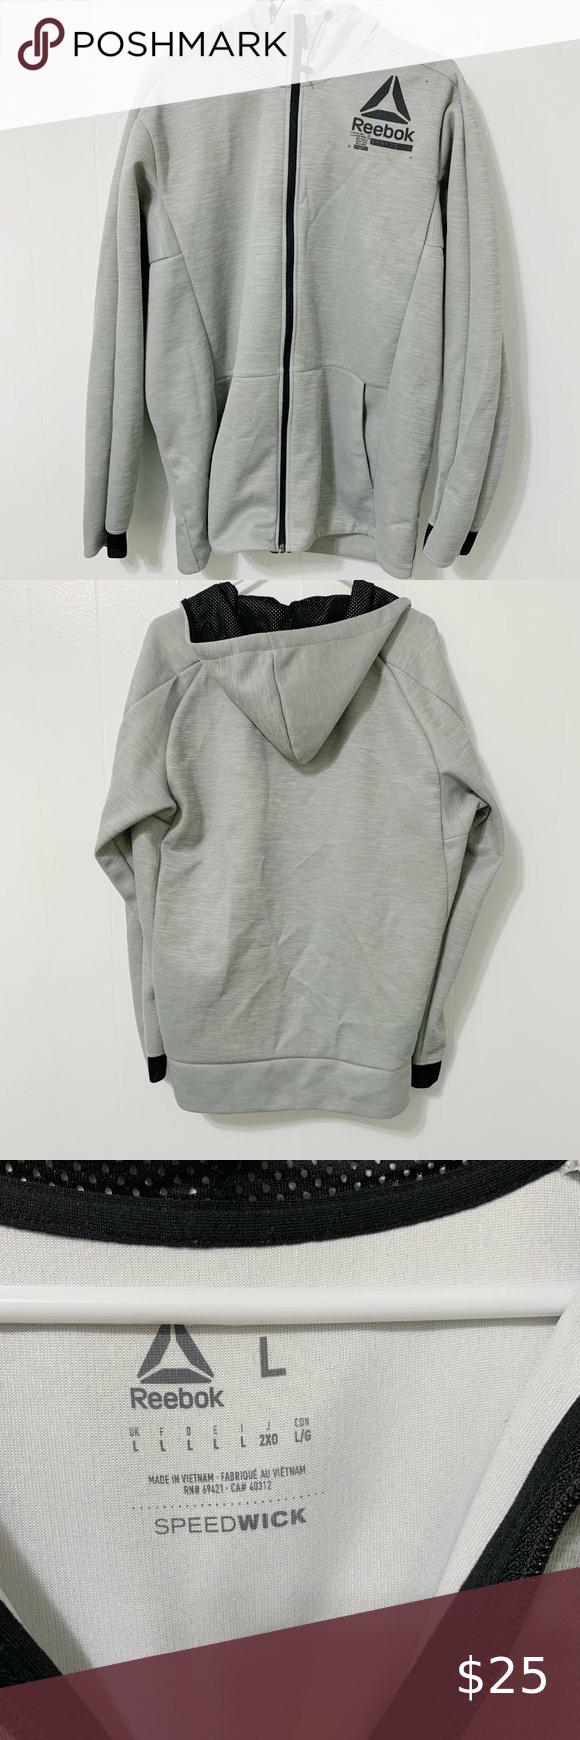 Reebok Speedwick Jacket Reebok Speedwick Jacket Size Large Like New Shoulder 18 1 2 P To P 22 1 2 Sleeve 25 1 2 Le Clothes Design Fashion Design Fashion [ 1740 x 580 Pixel ]